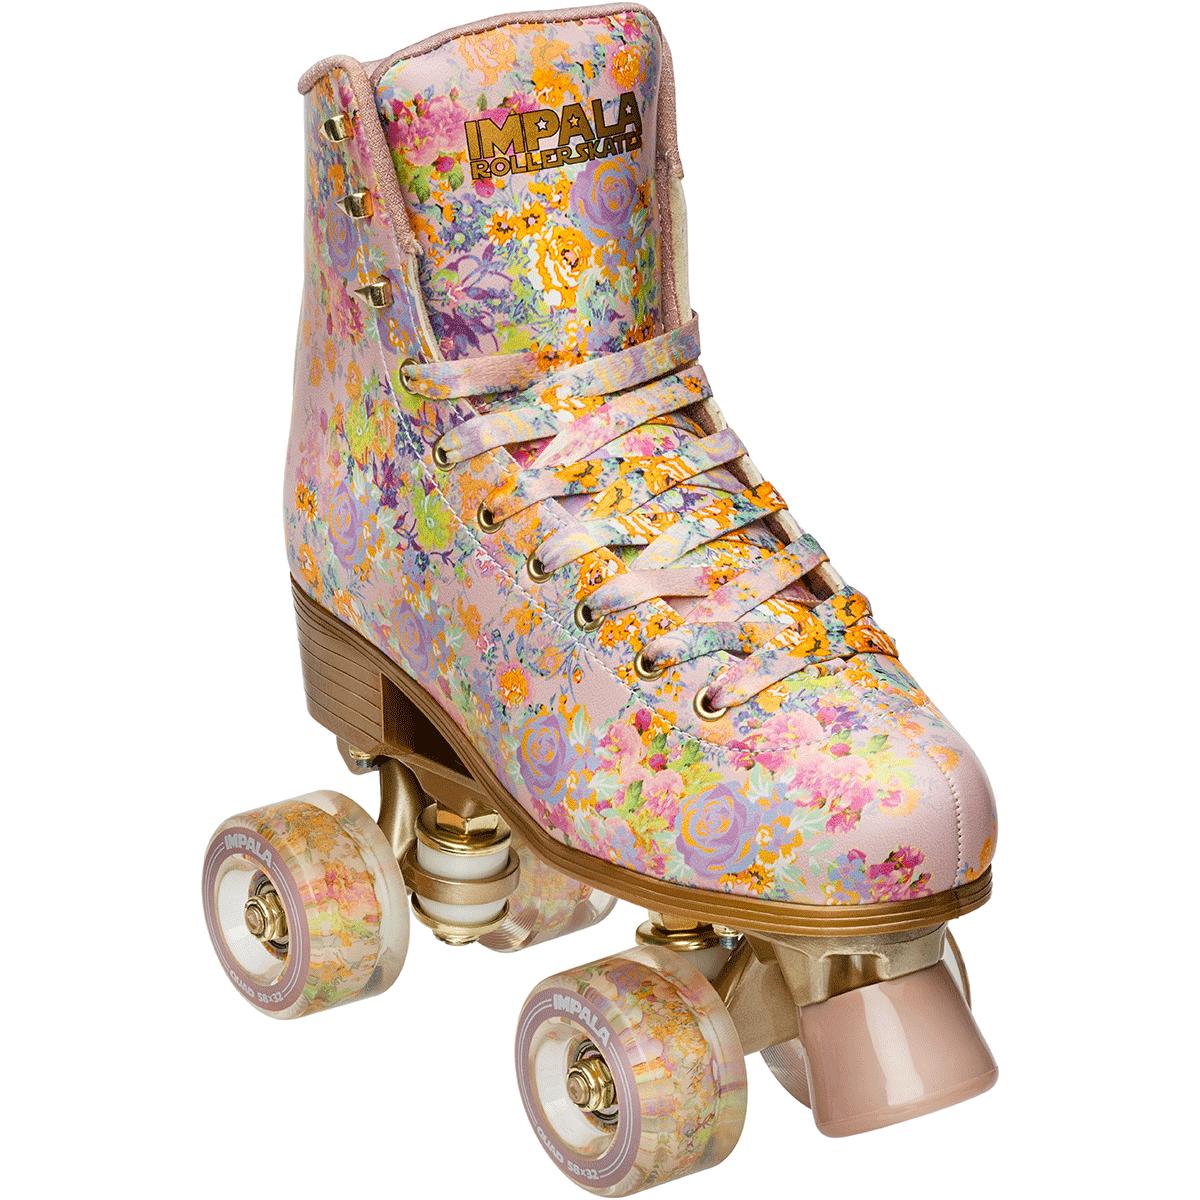 INSTOCK Cynthia Rowley IMPALA Floral Rollerskates